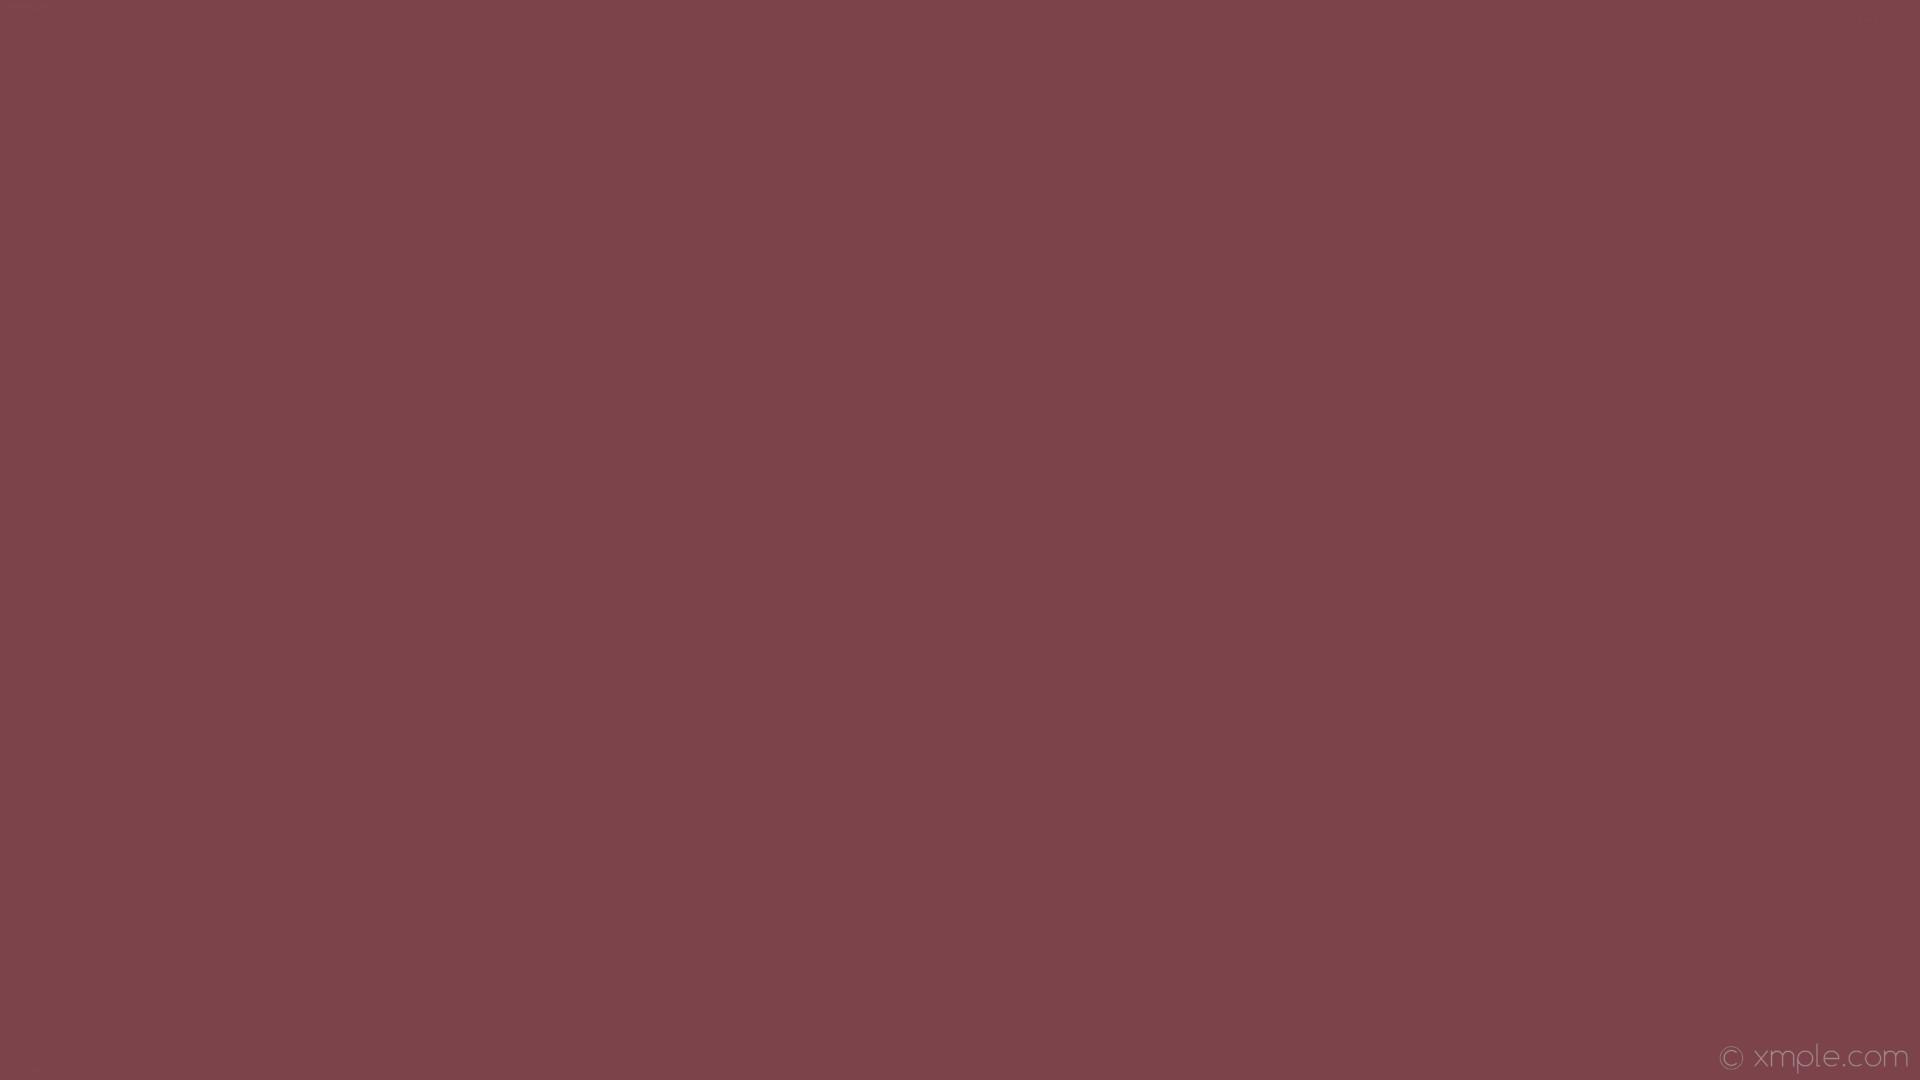 wallpaper single red plain solid color one colour #7c434b